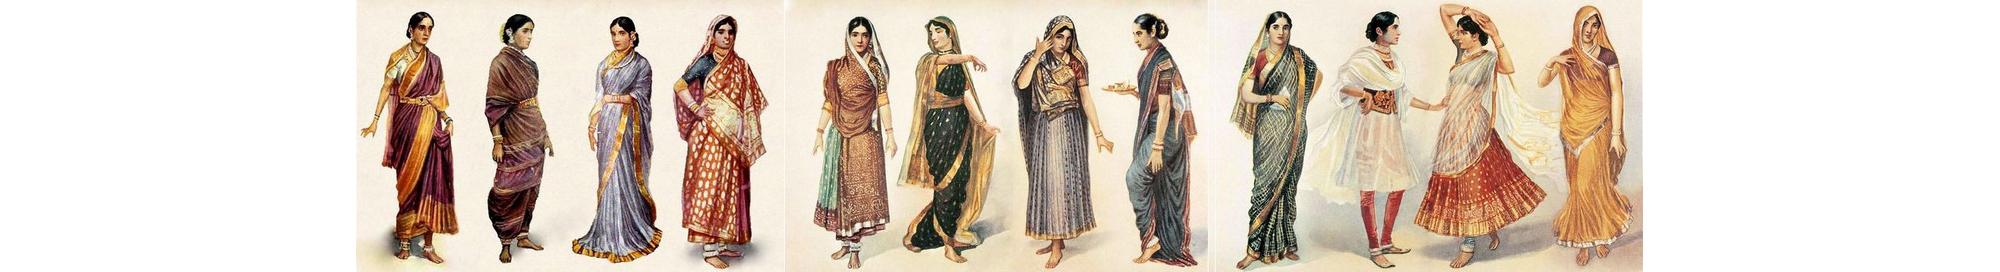 Mulheres indianas